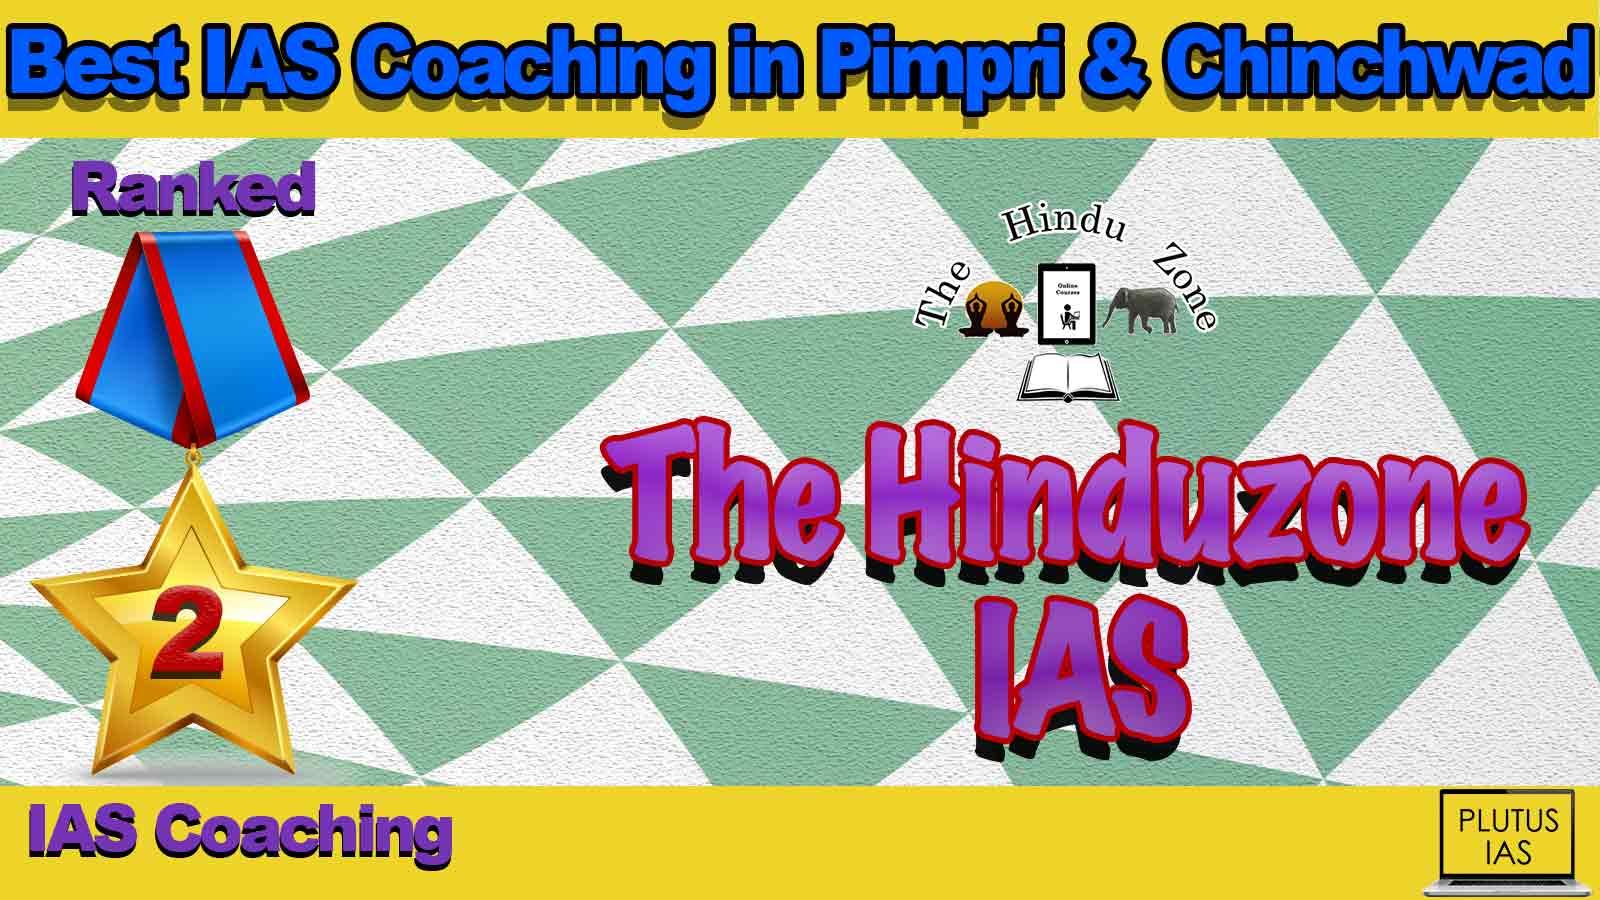 Best IAS Coaching in Pimpri Chinchwad